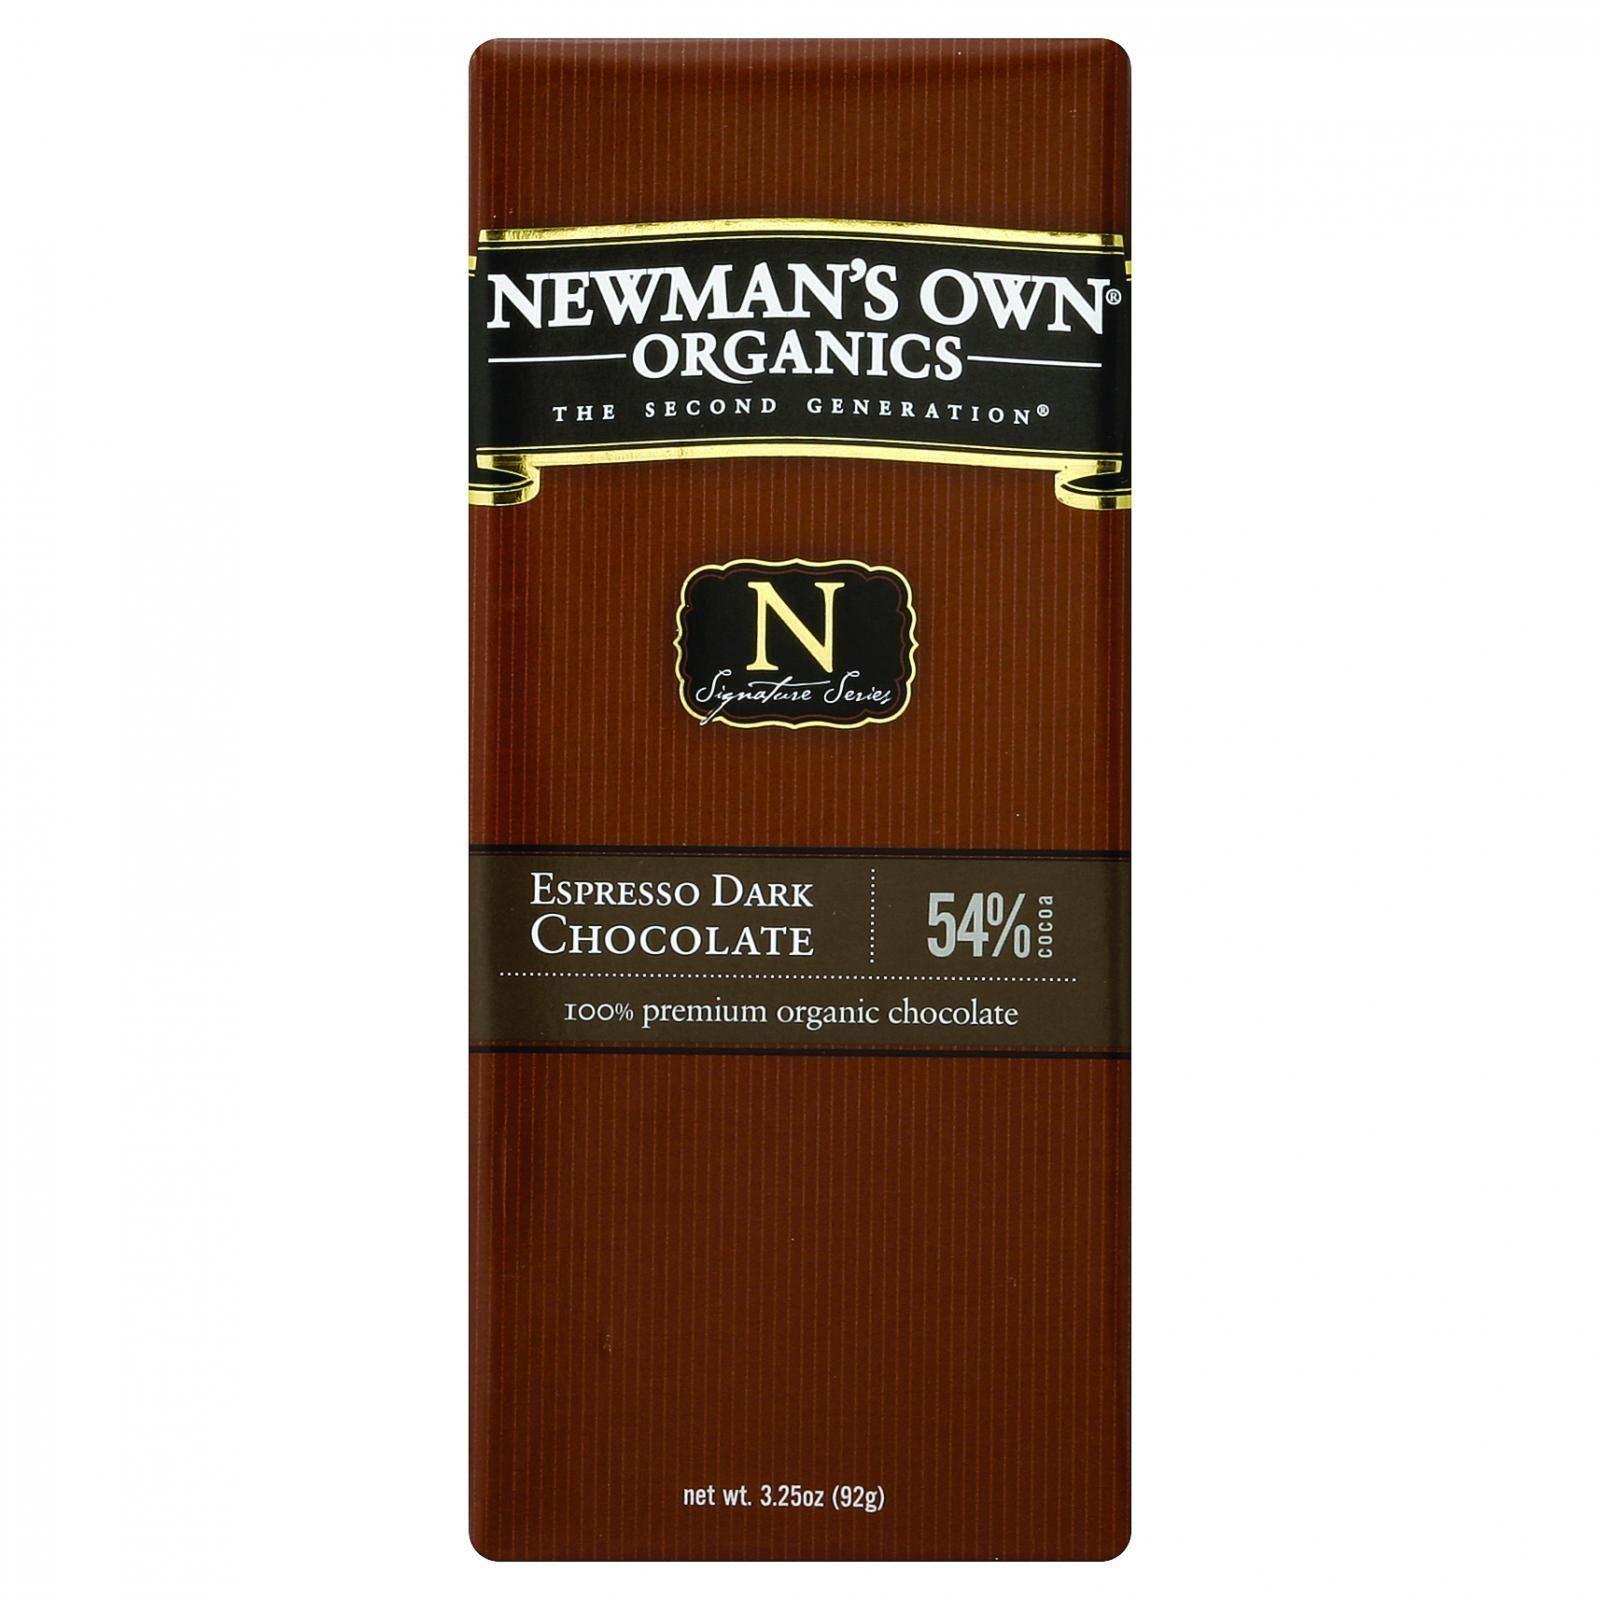 Newman's Own Organics Chocolate Bar - Organic - Dark Chocolate - Espresso - 3.25 oz Bars - Case of 12